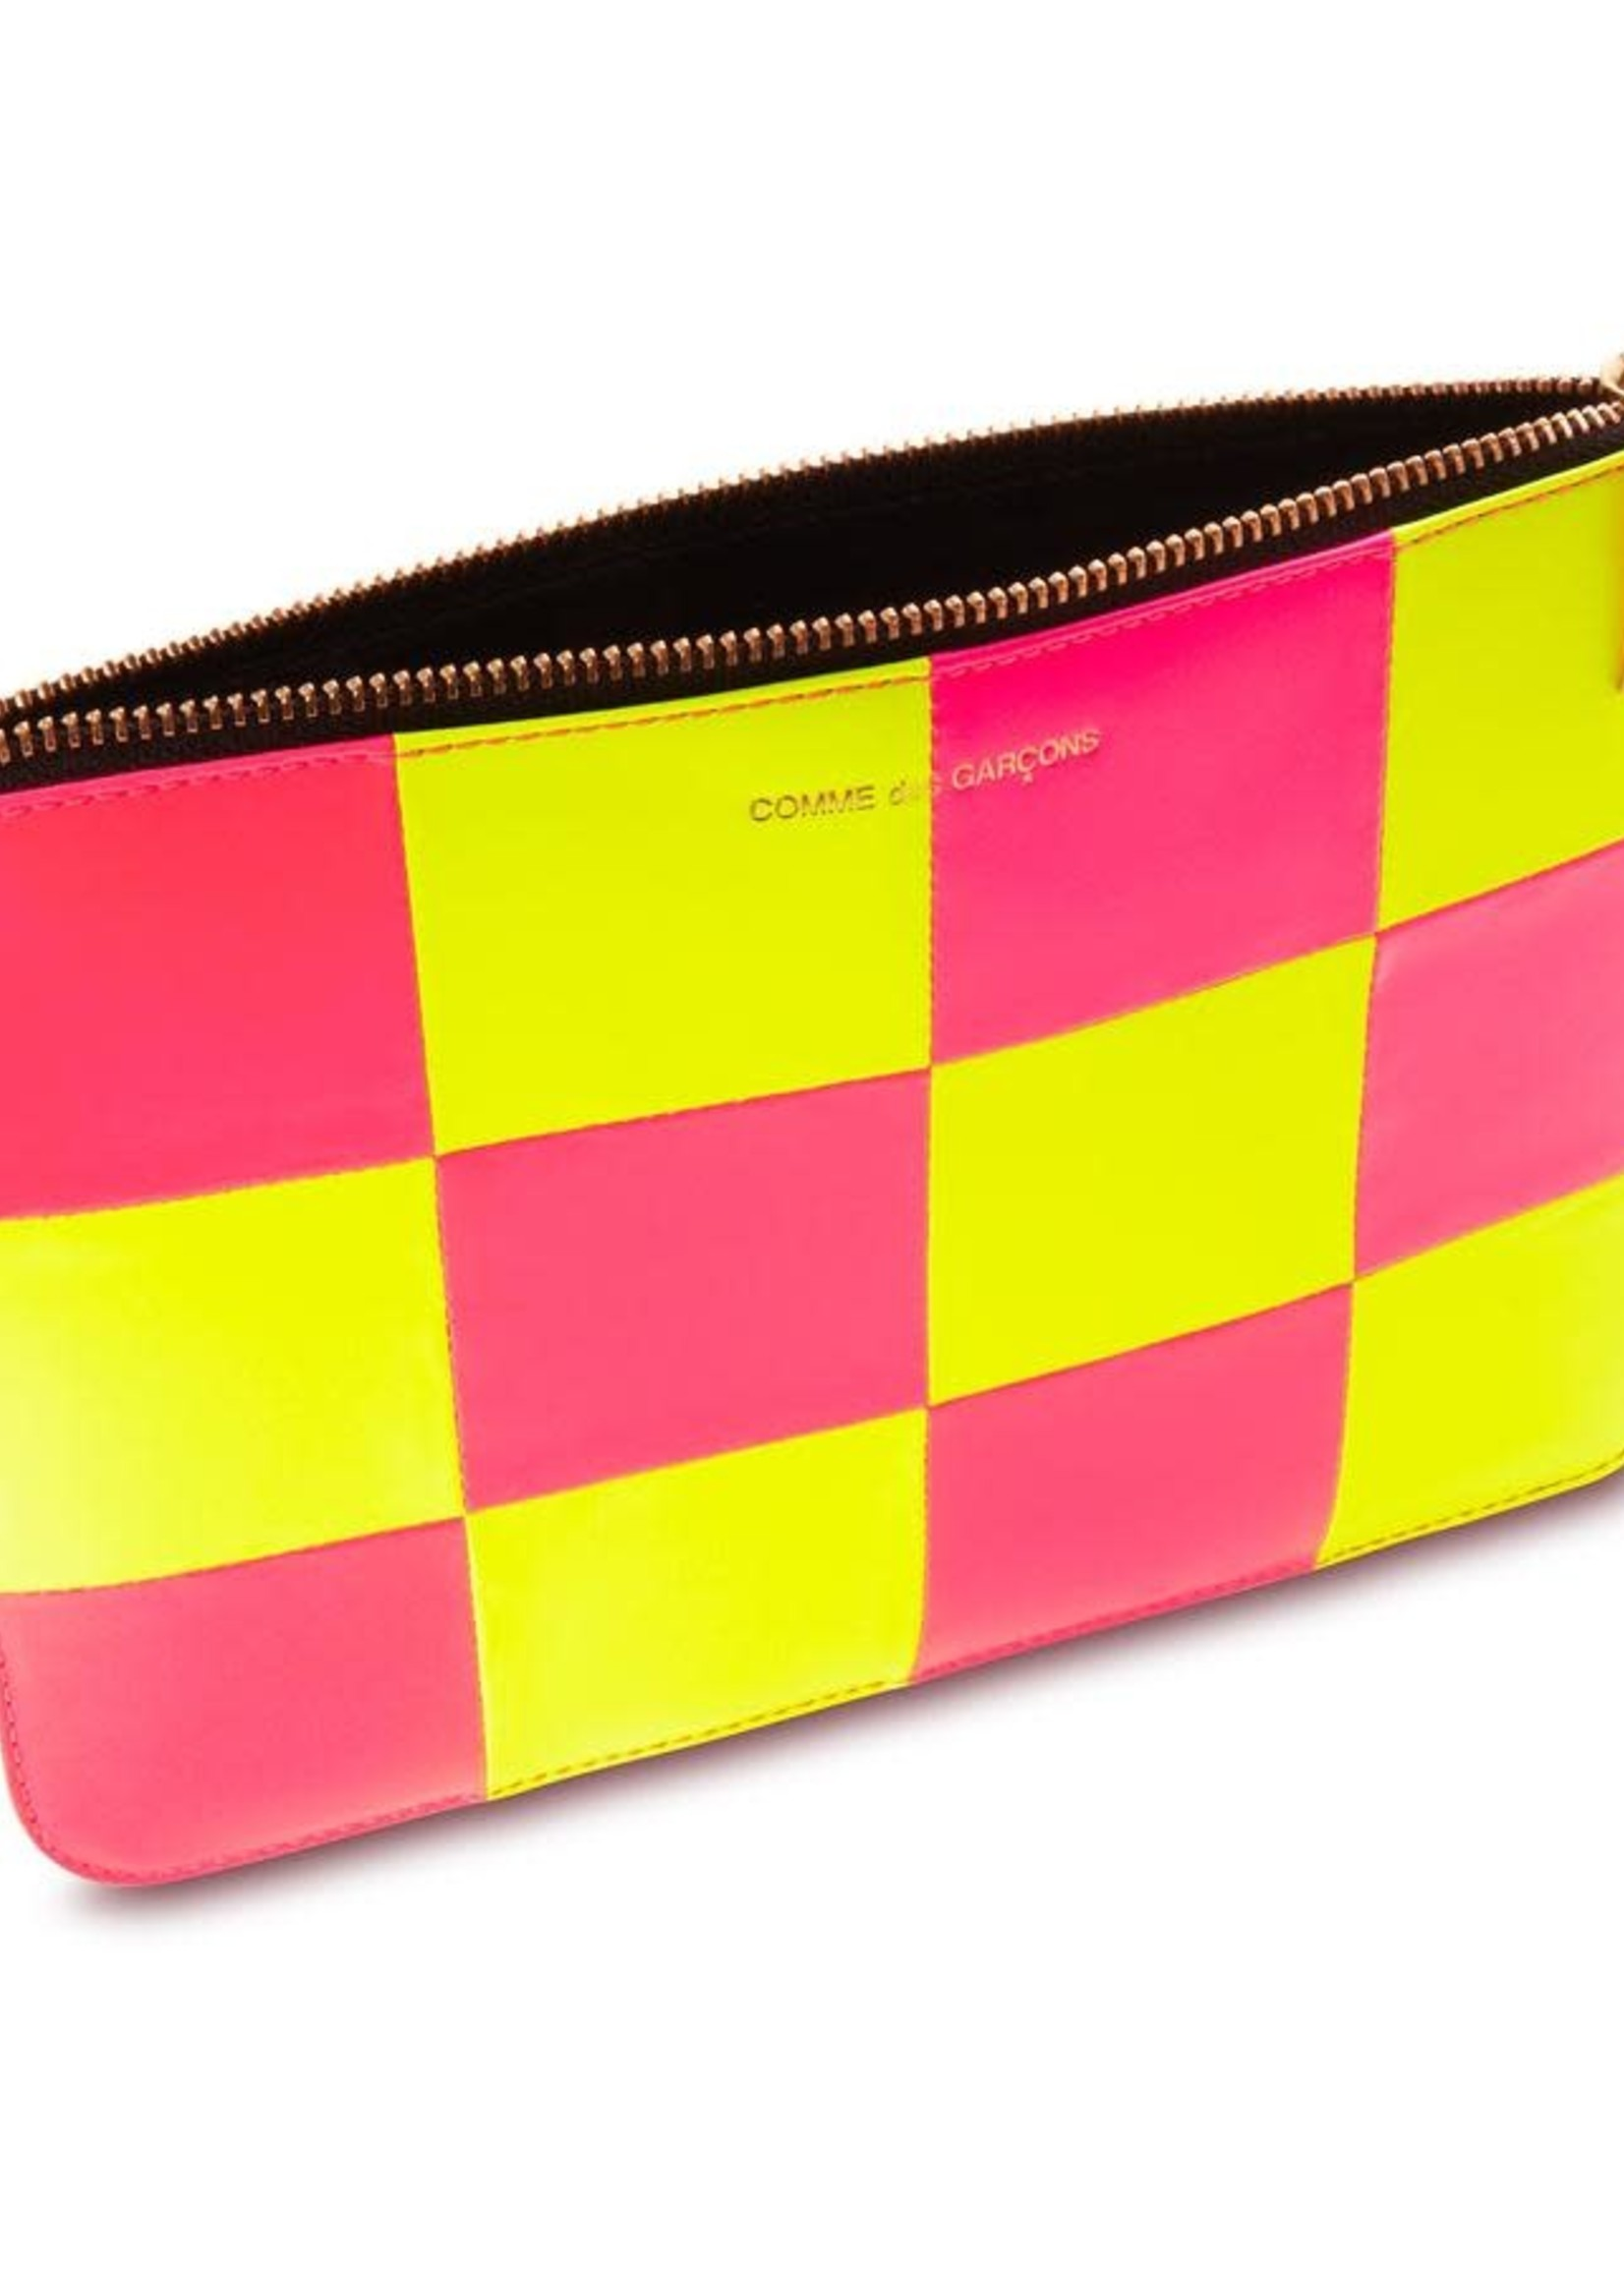 COMME des GARÇONS WALLET Large Neon Checkerboard Zip Pouch